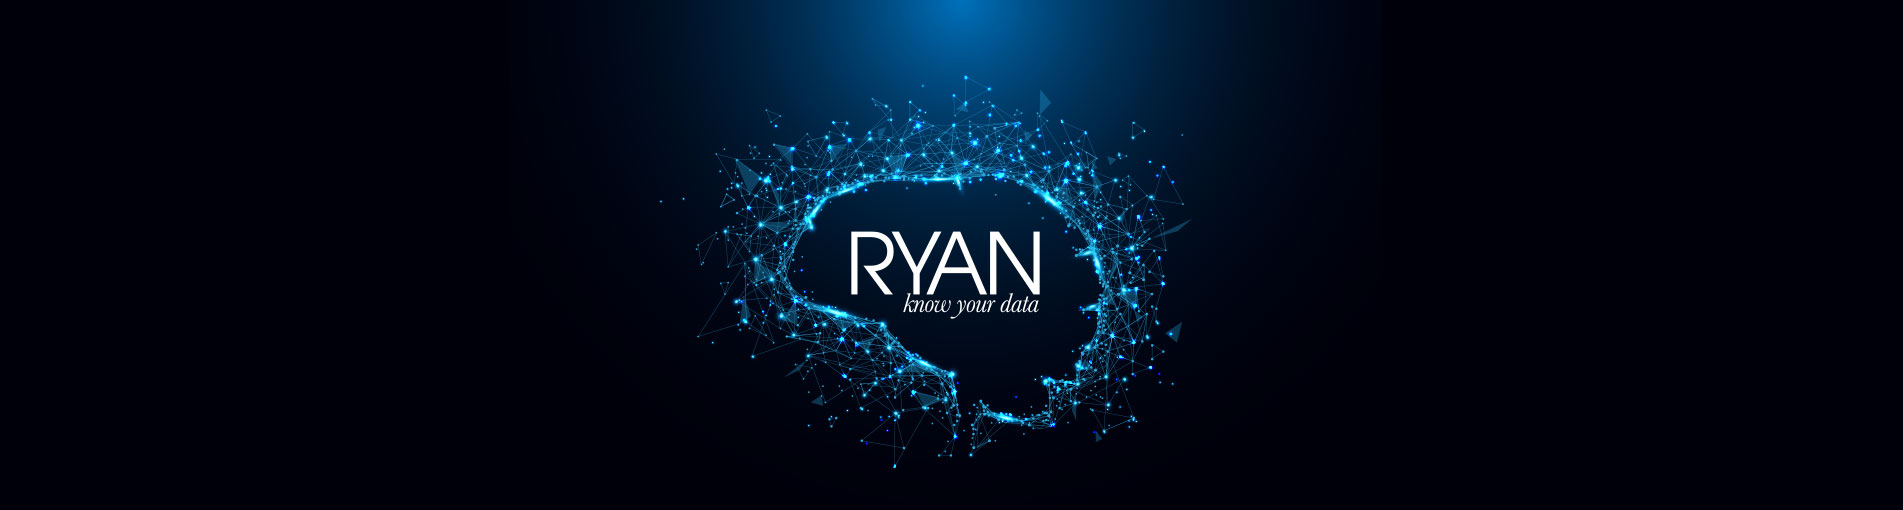 RYAN-Header-Image